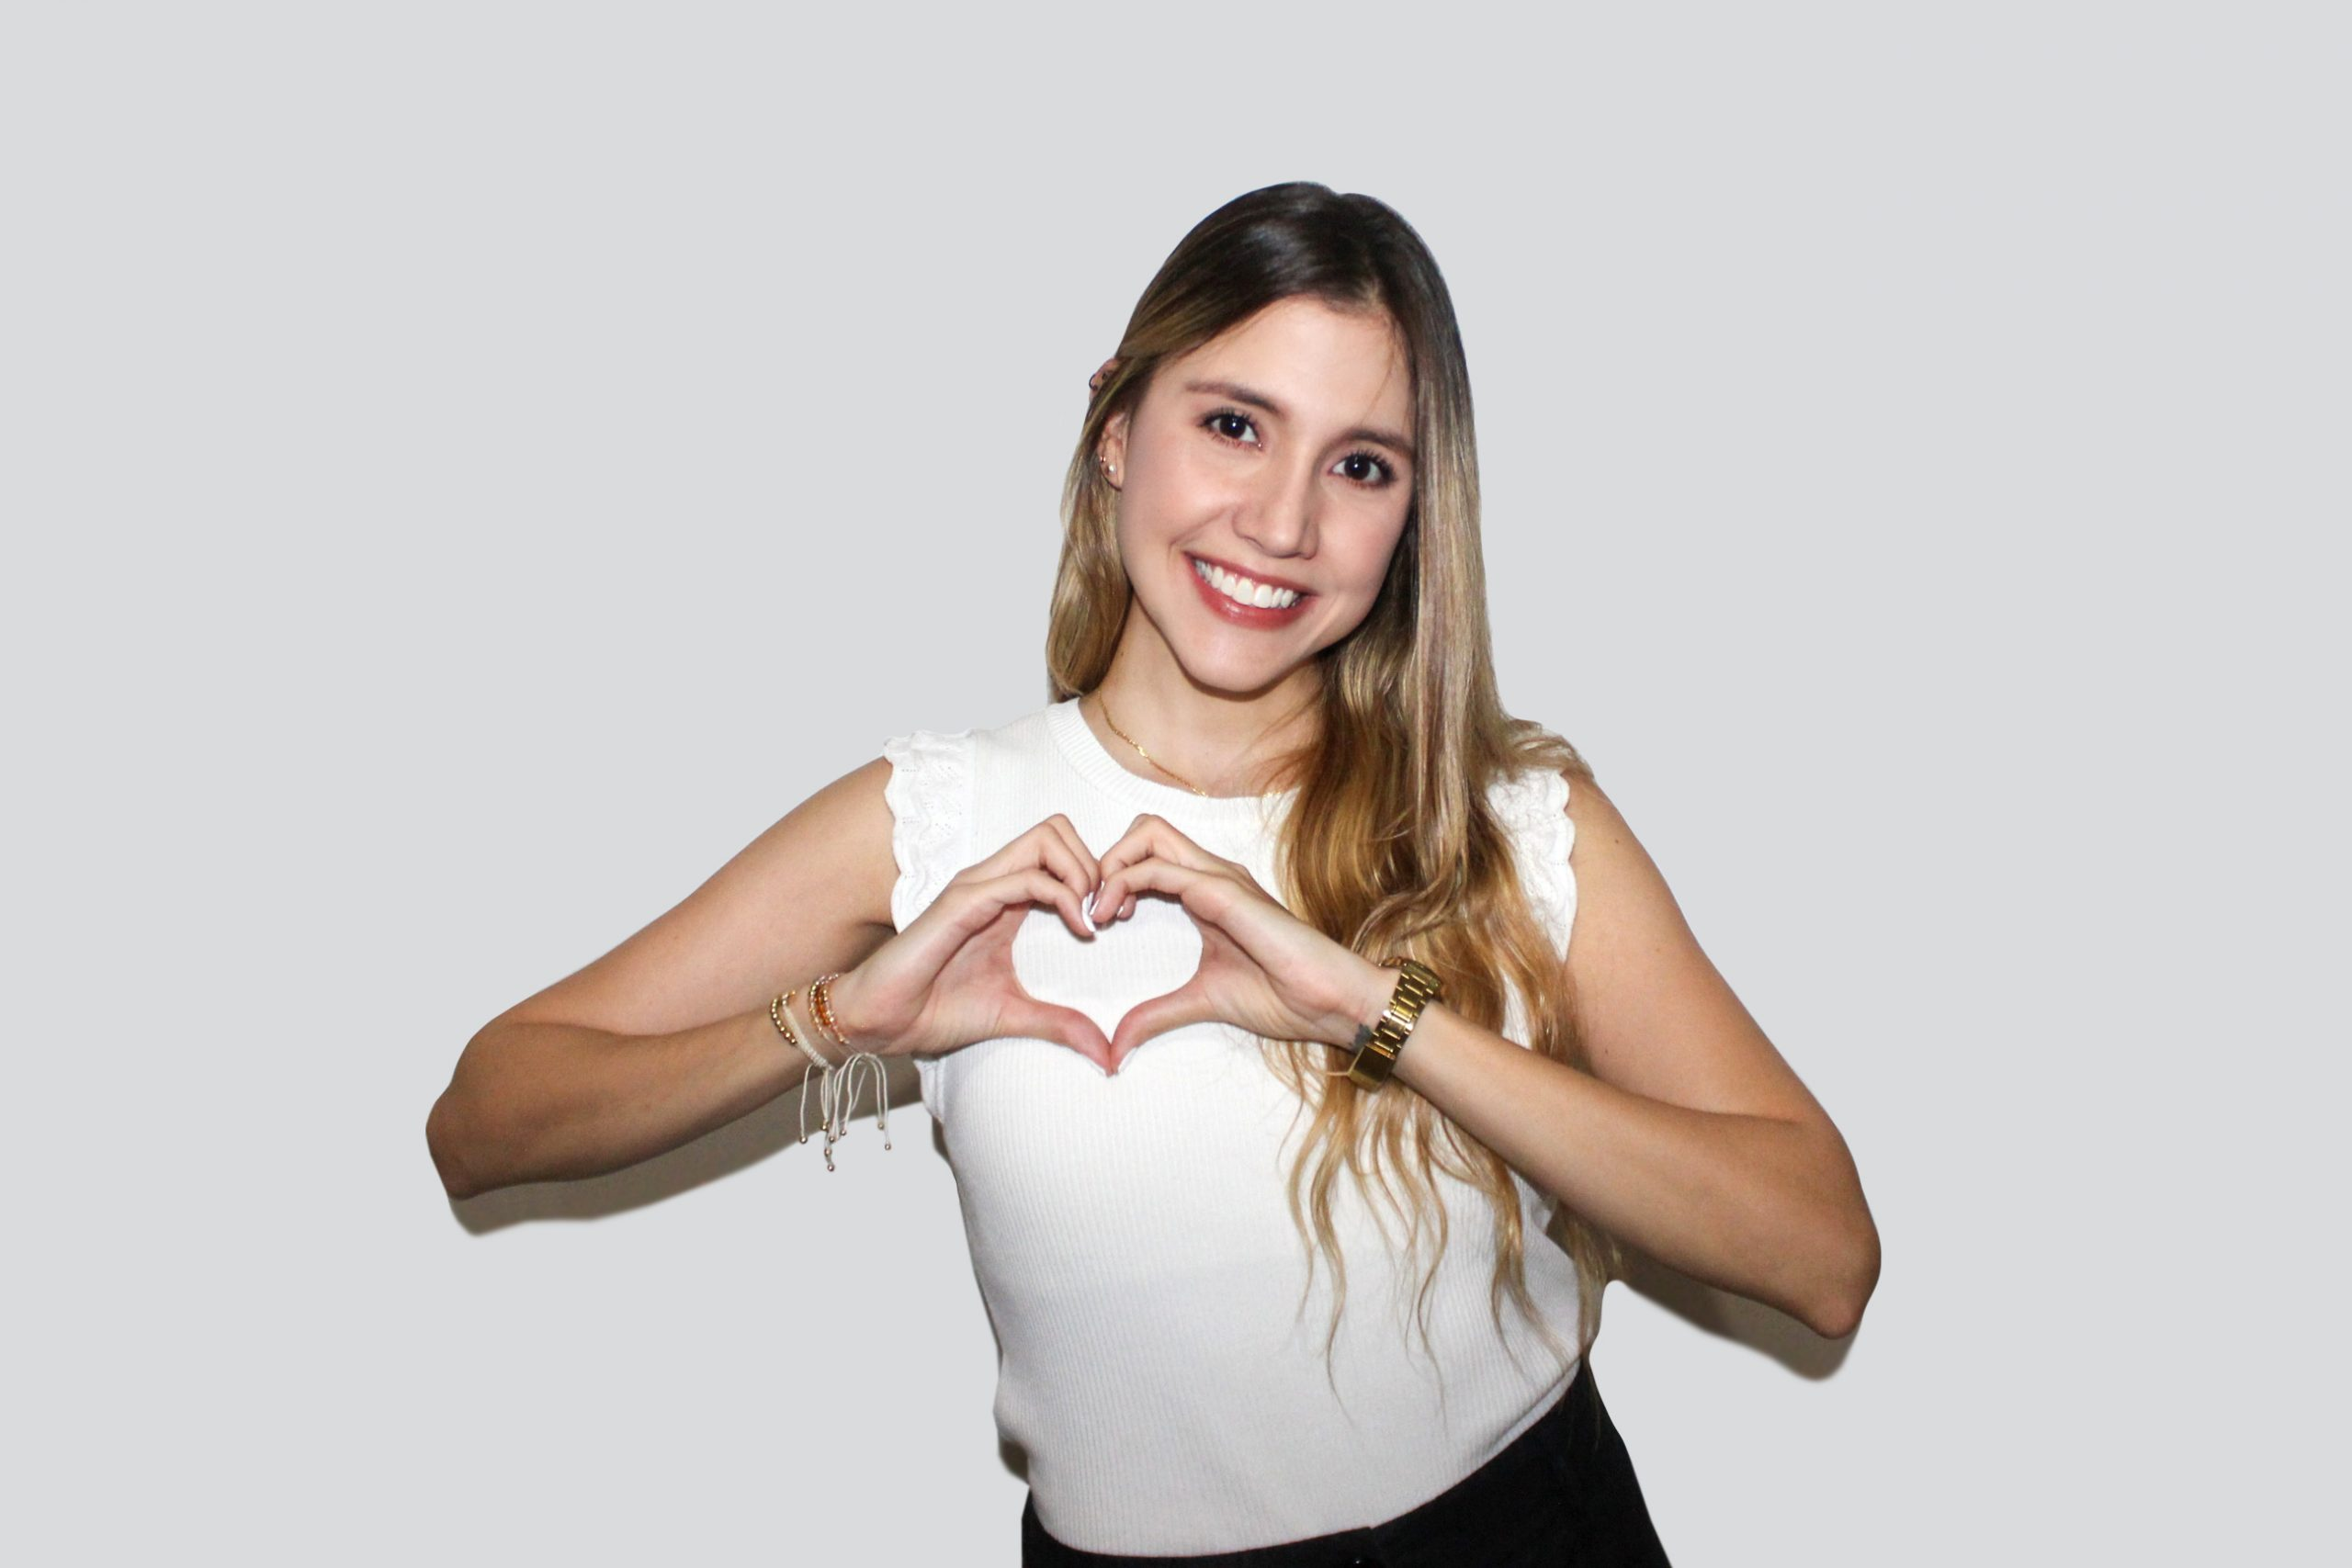 maria Camila cuadros